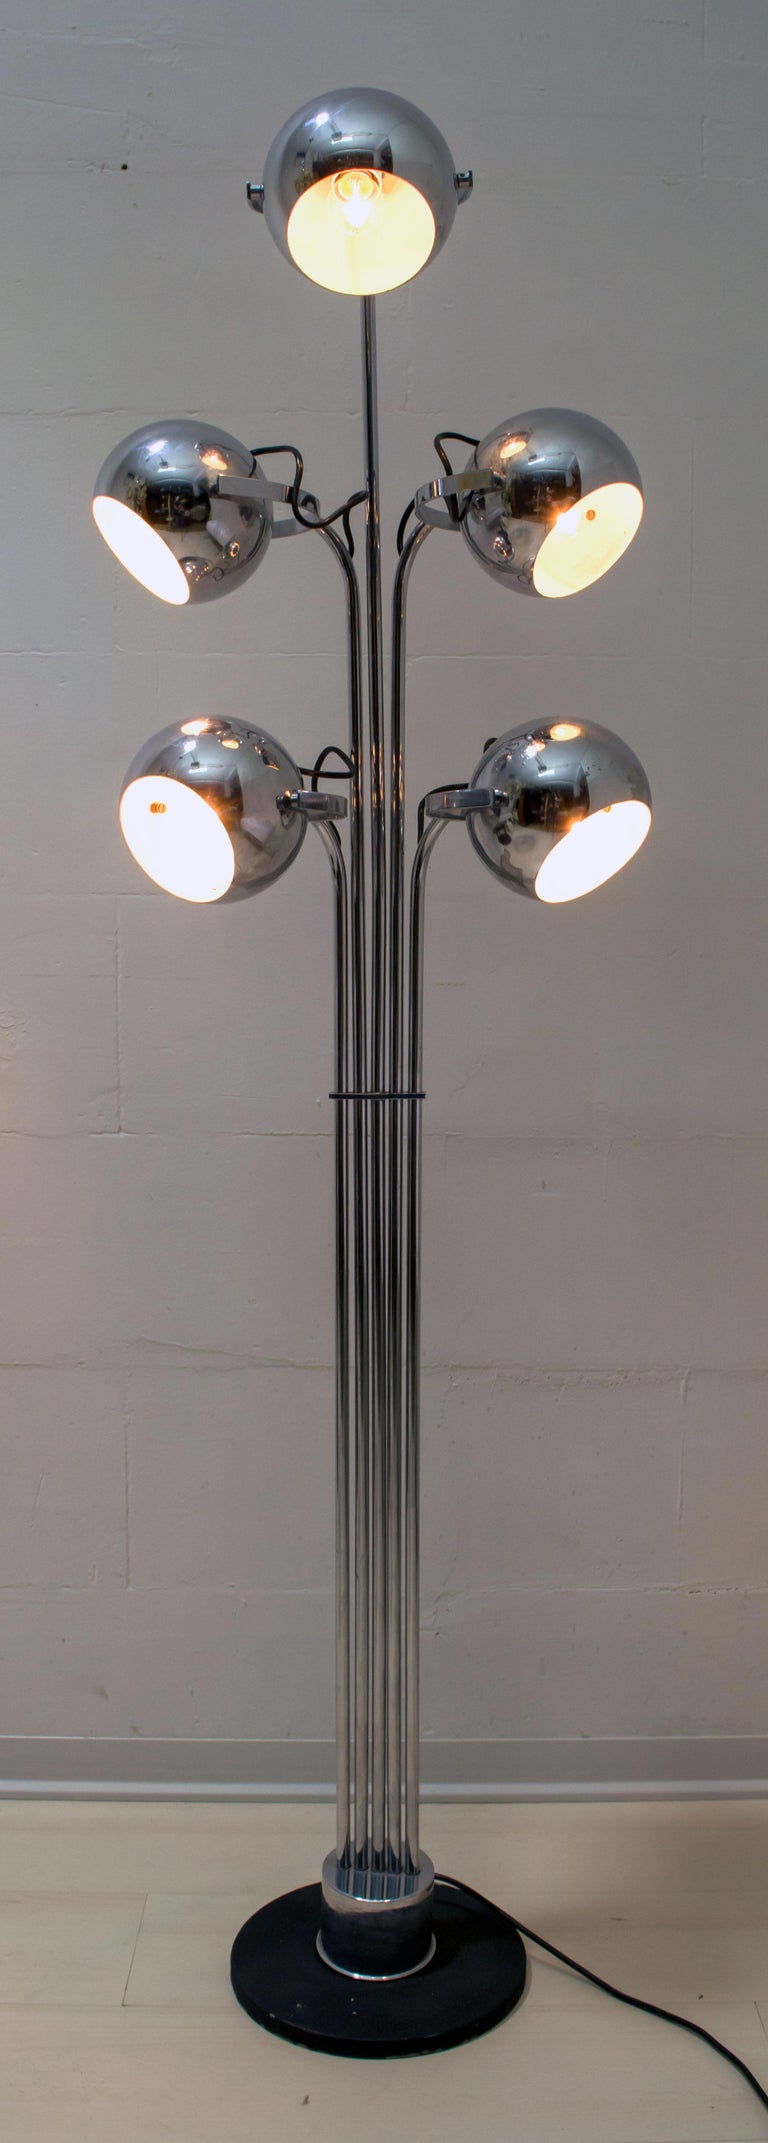 Late 20th Century Goffredo Reggiani Mid-Century Modern Italian 5 Lights Chrome Floor Lamp, 1970s For Sale